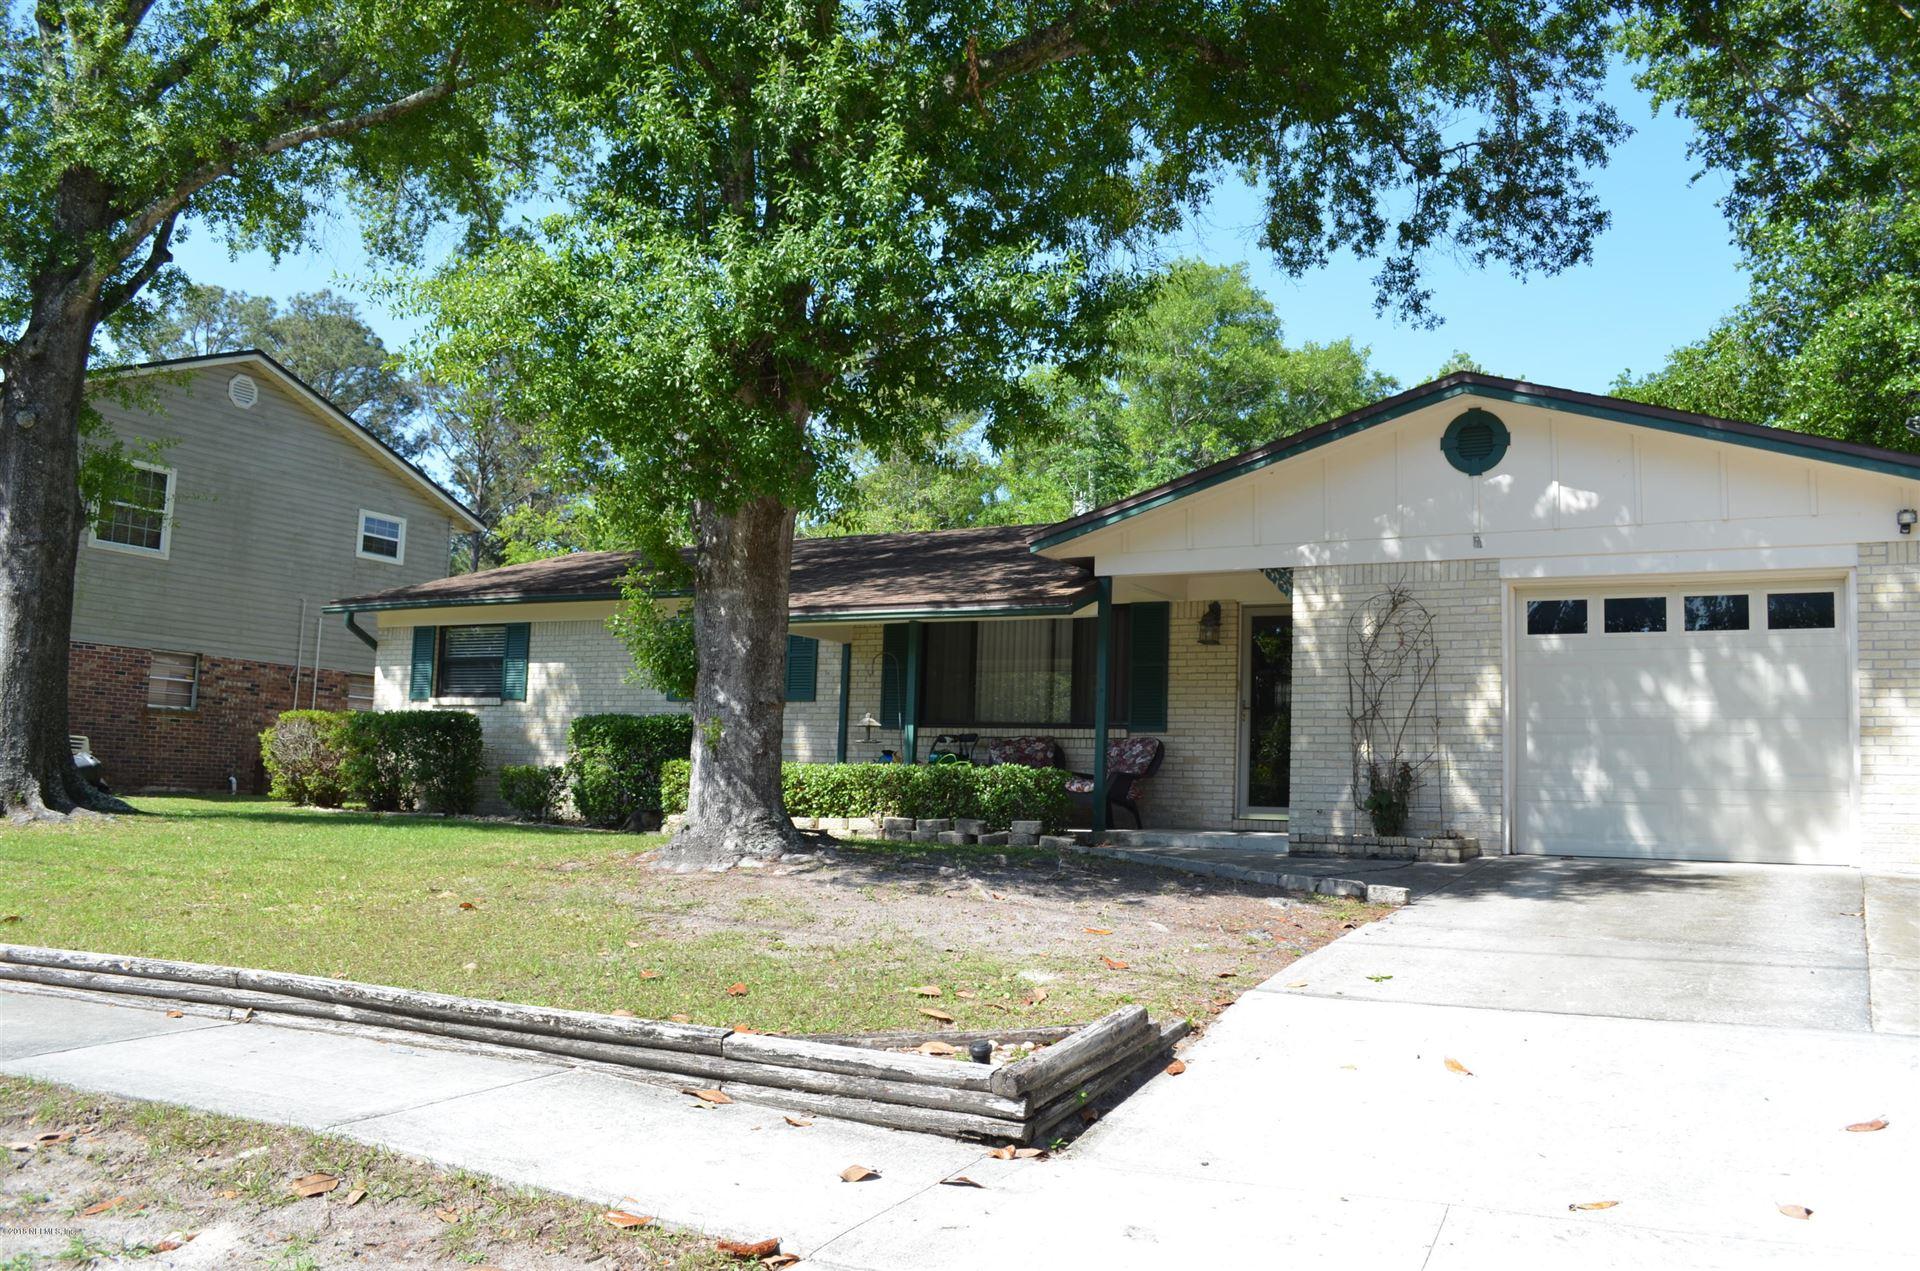 1706 GROVE PARK DR, Orange Park, FL 32073 - MLS#: 1109077